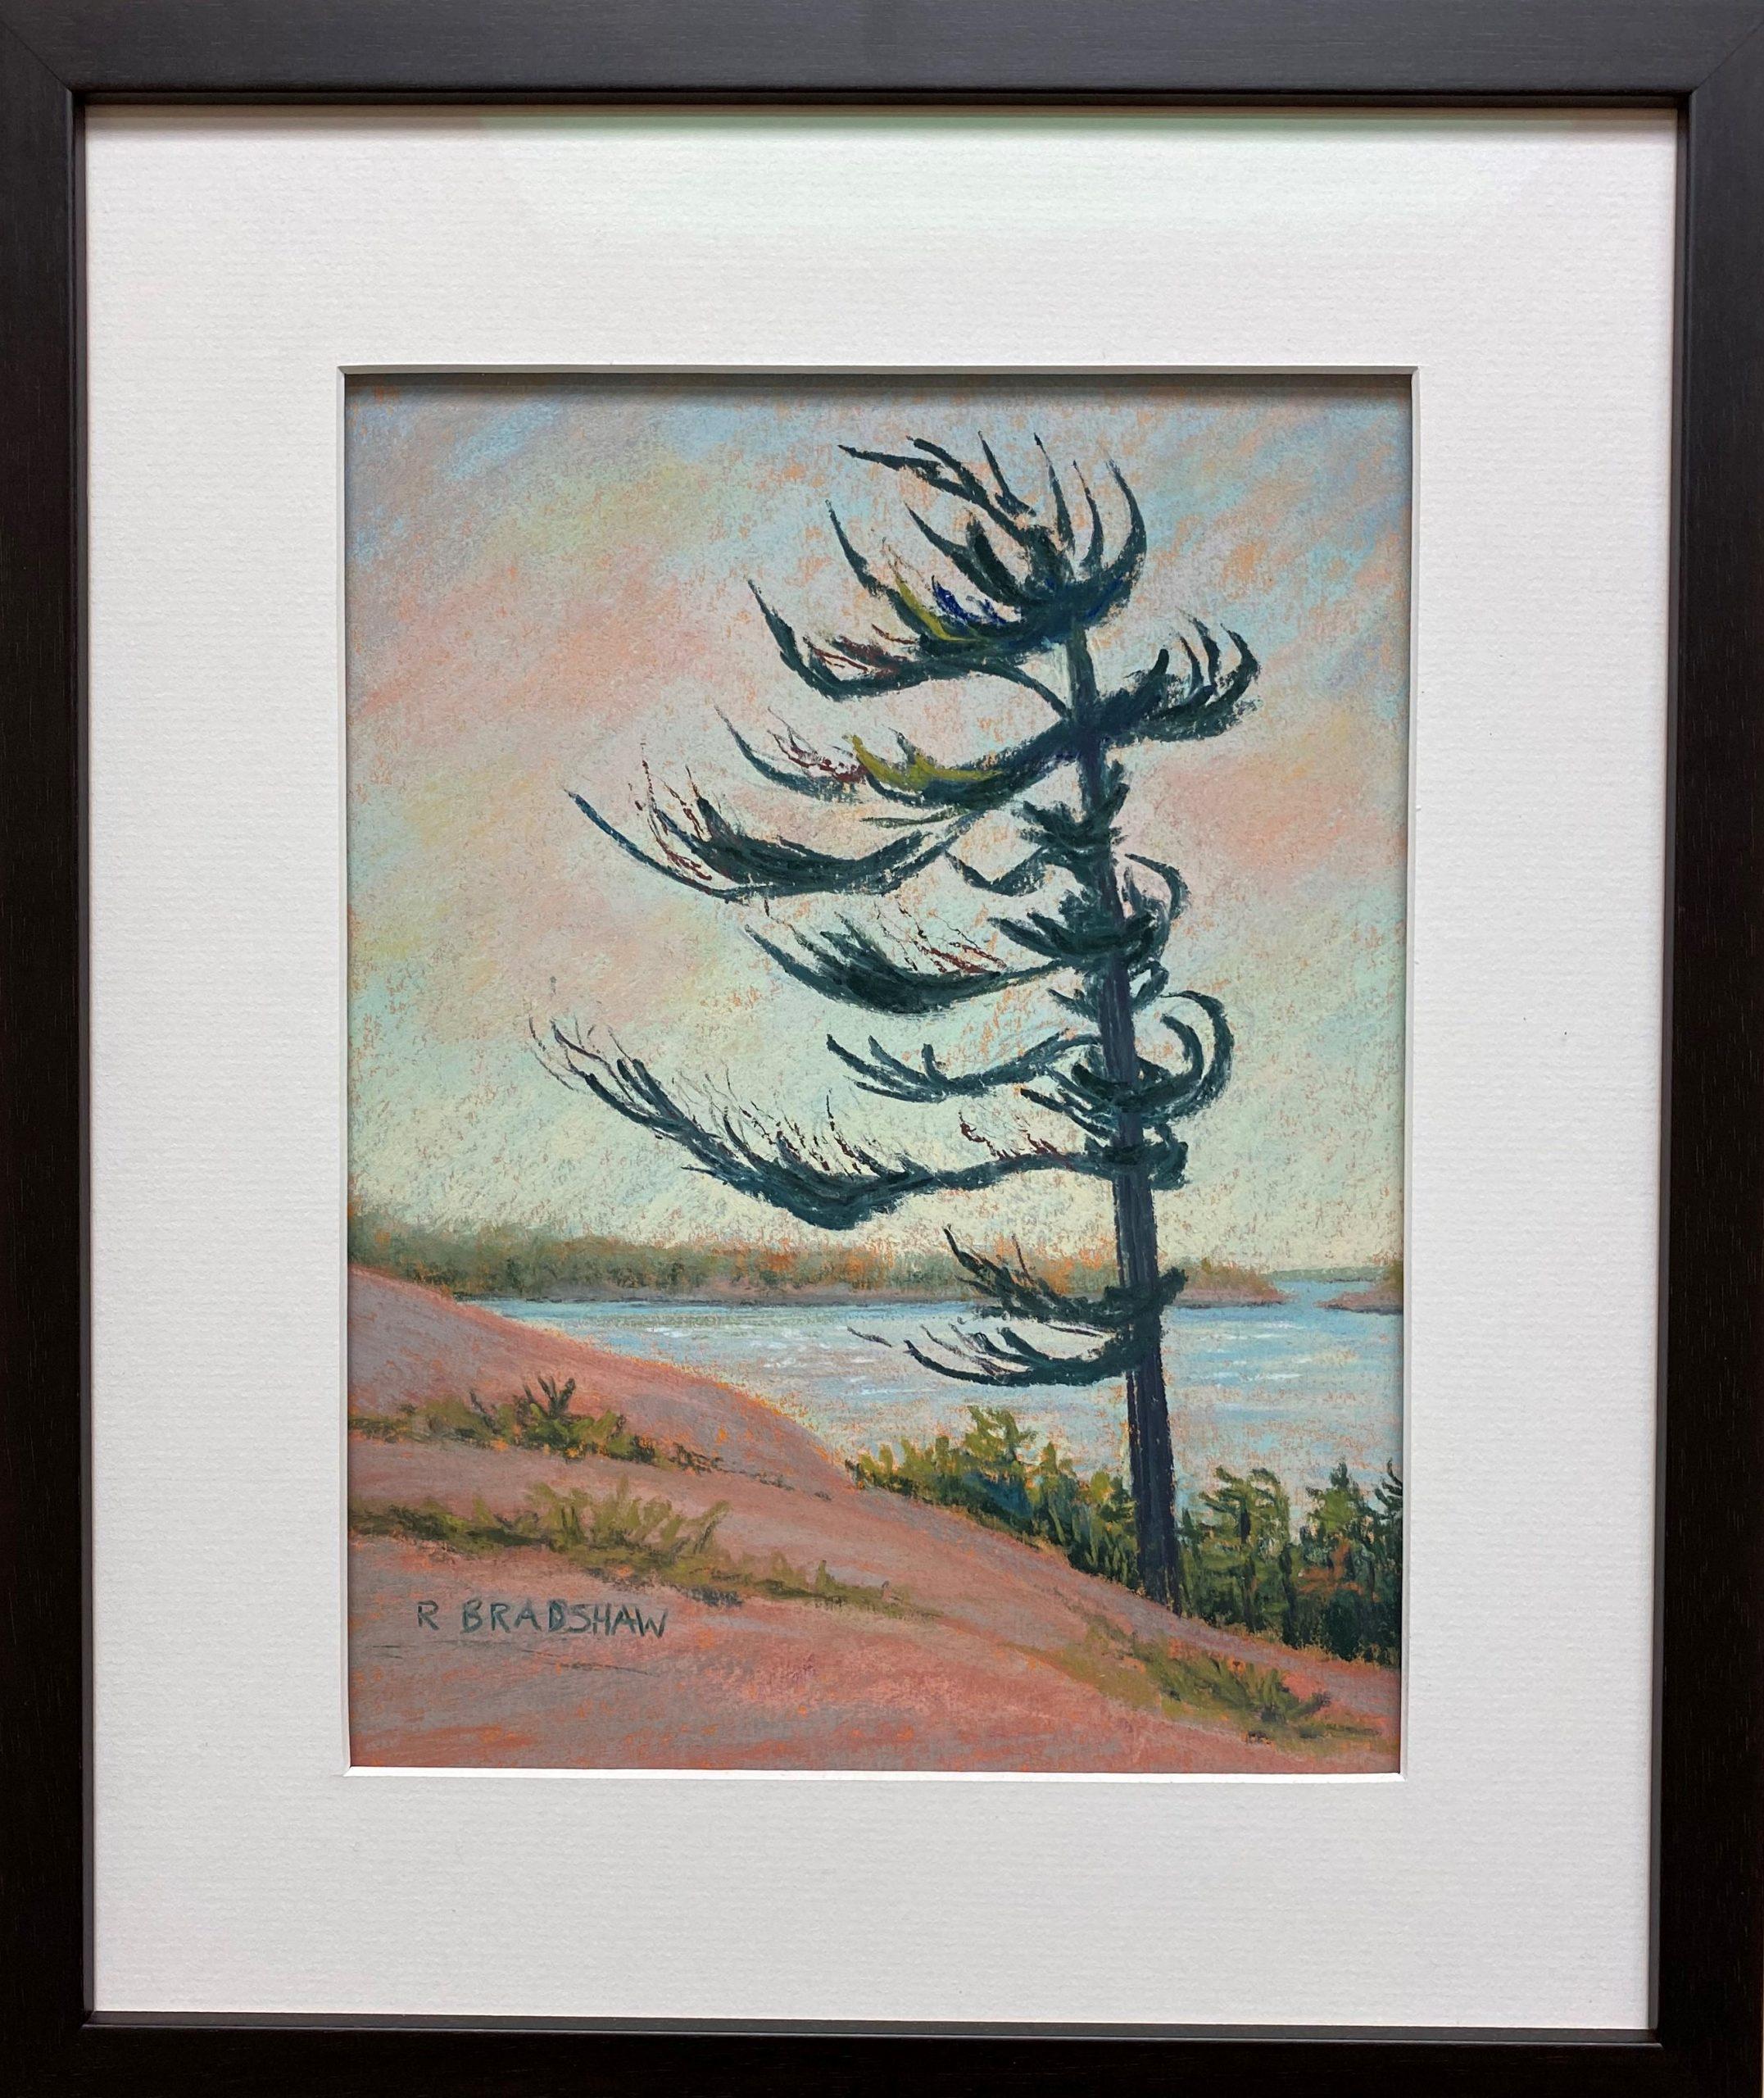 An image of Renata Bradshaw pastel landscape painting Windswept 2